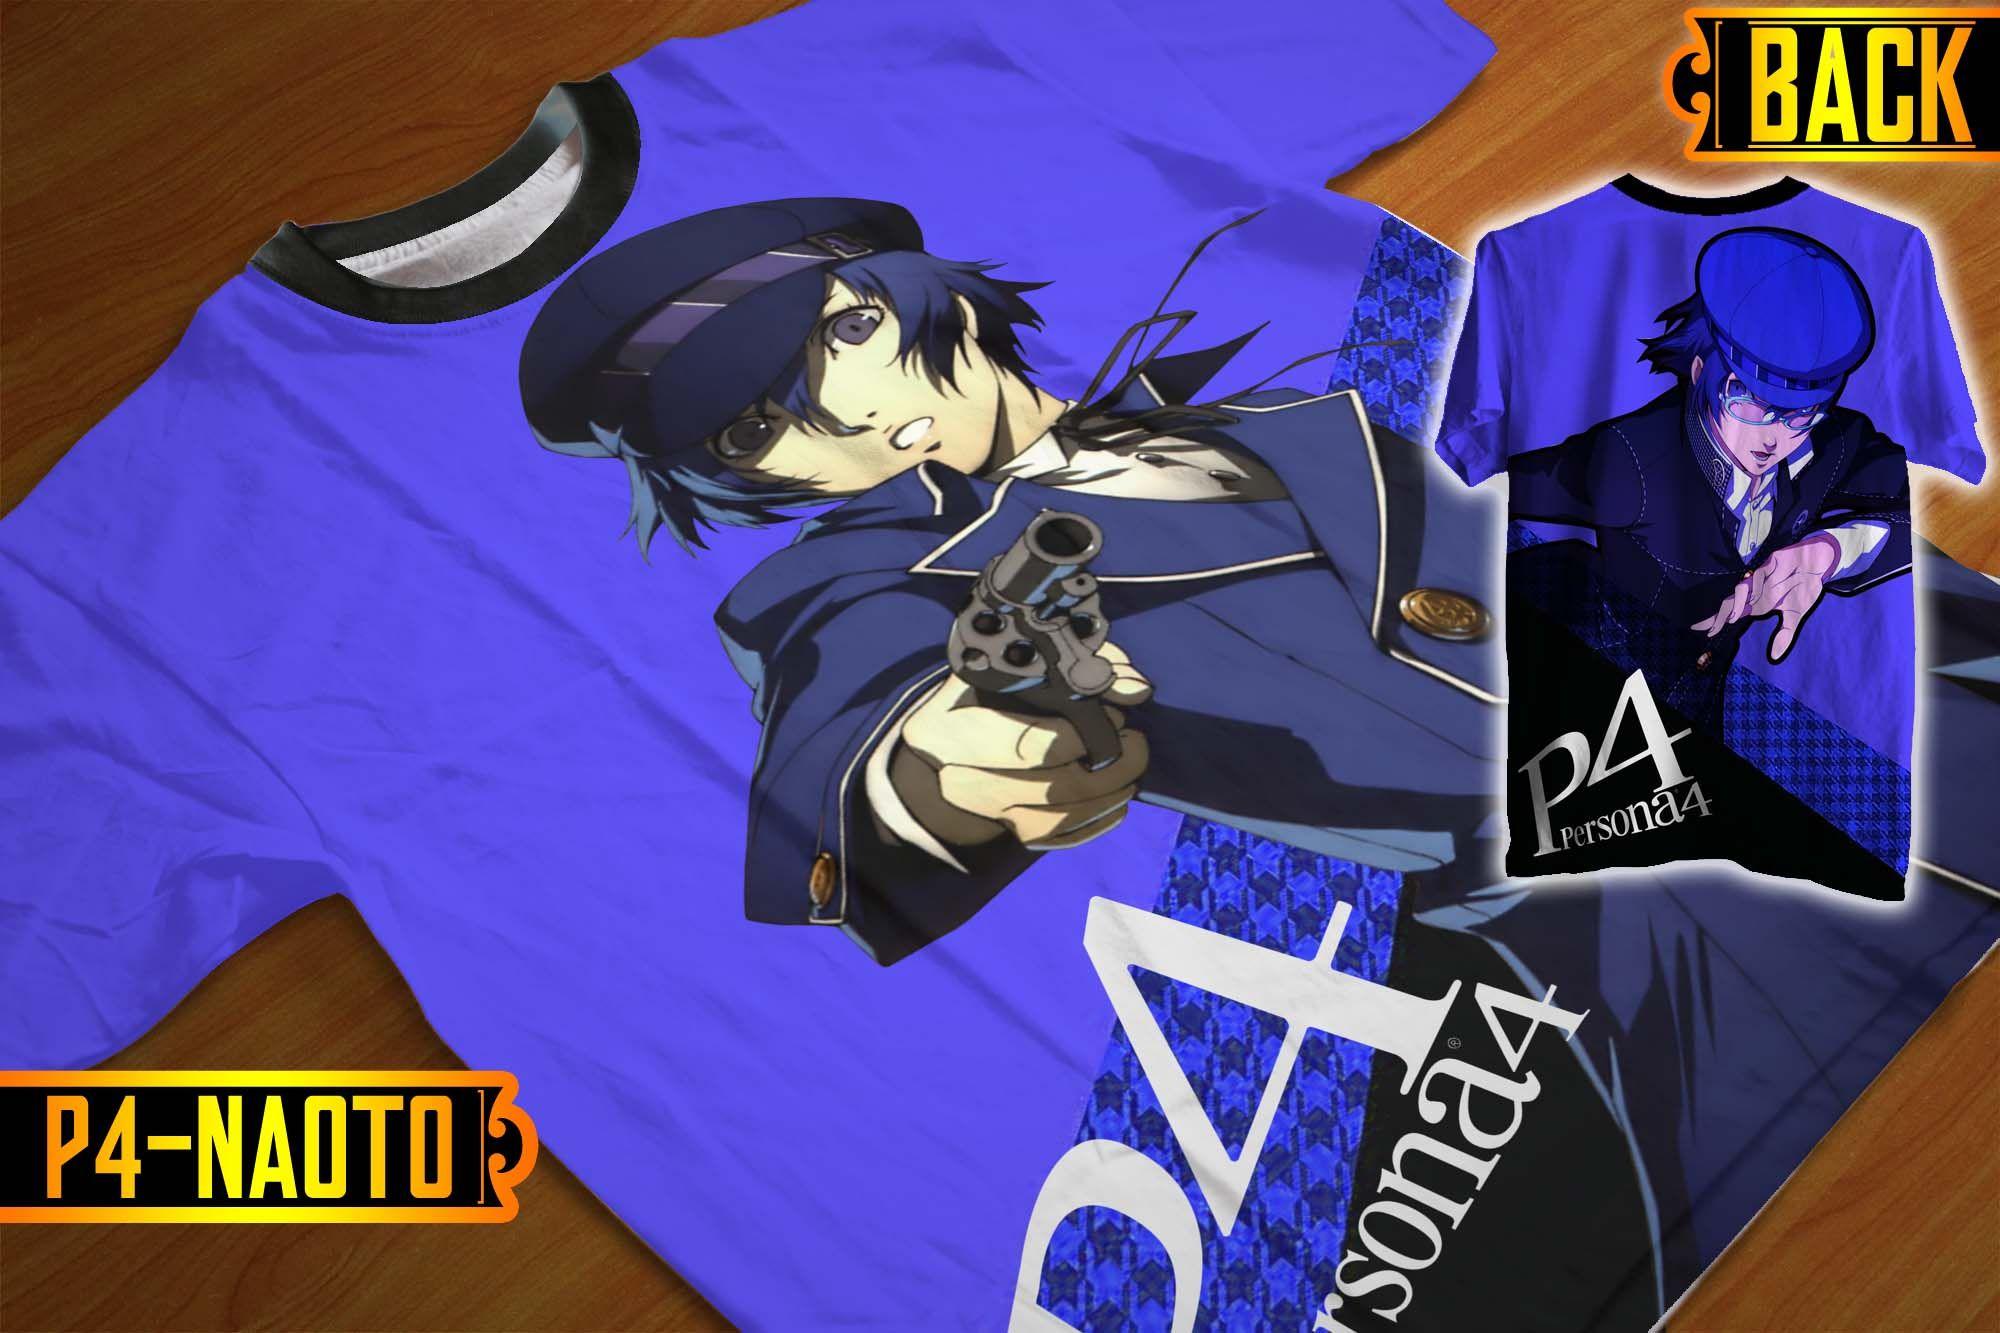 Jual [ANIME/GAME] Tshirt/Kaos Fullprint Persona 4